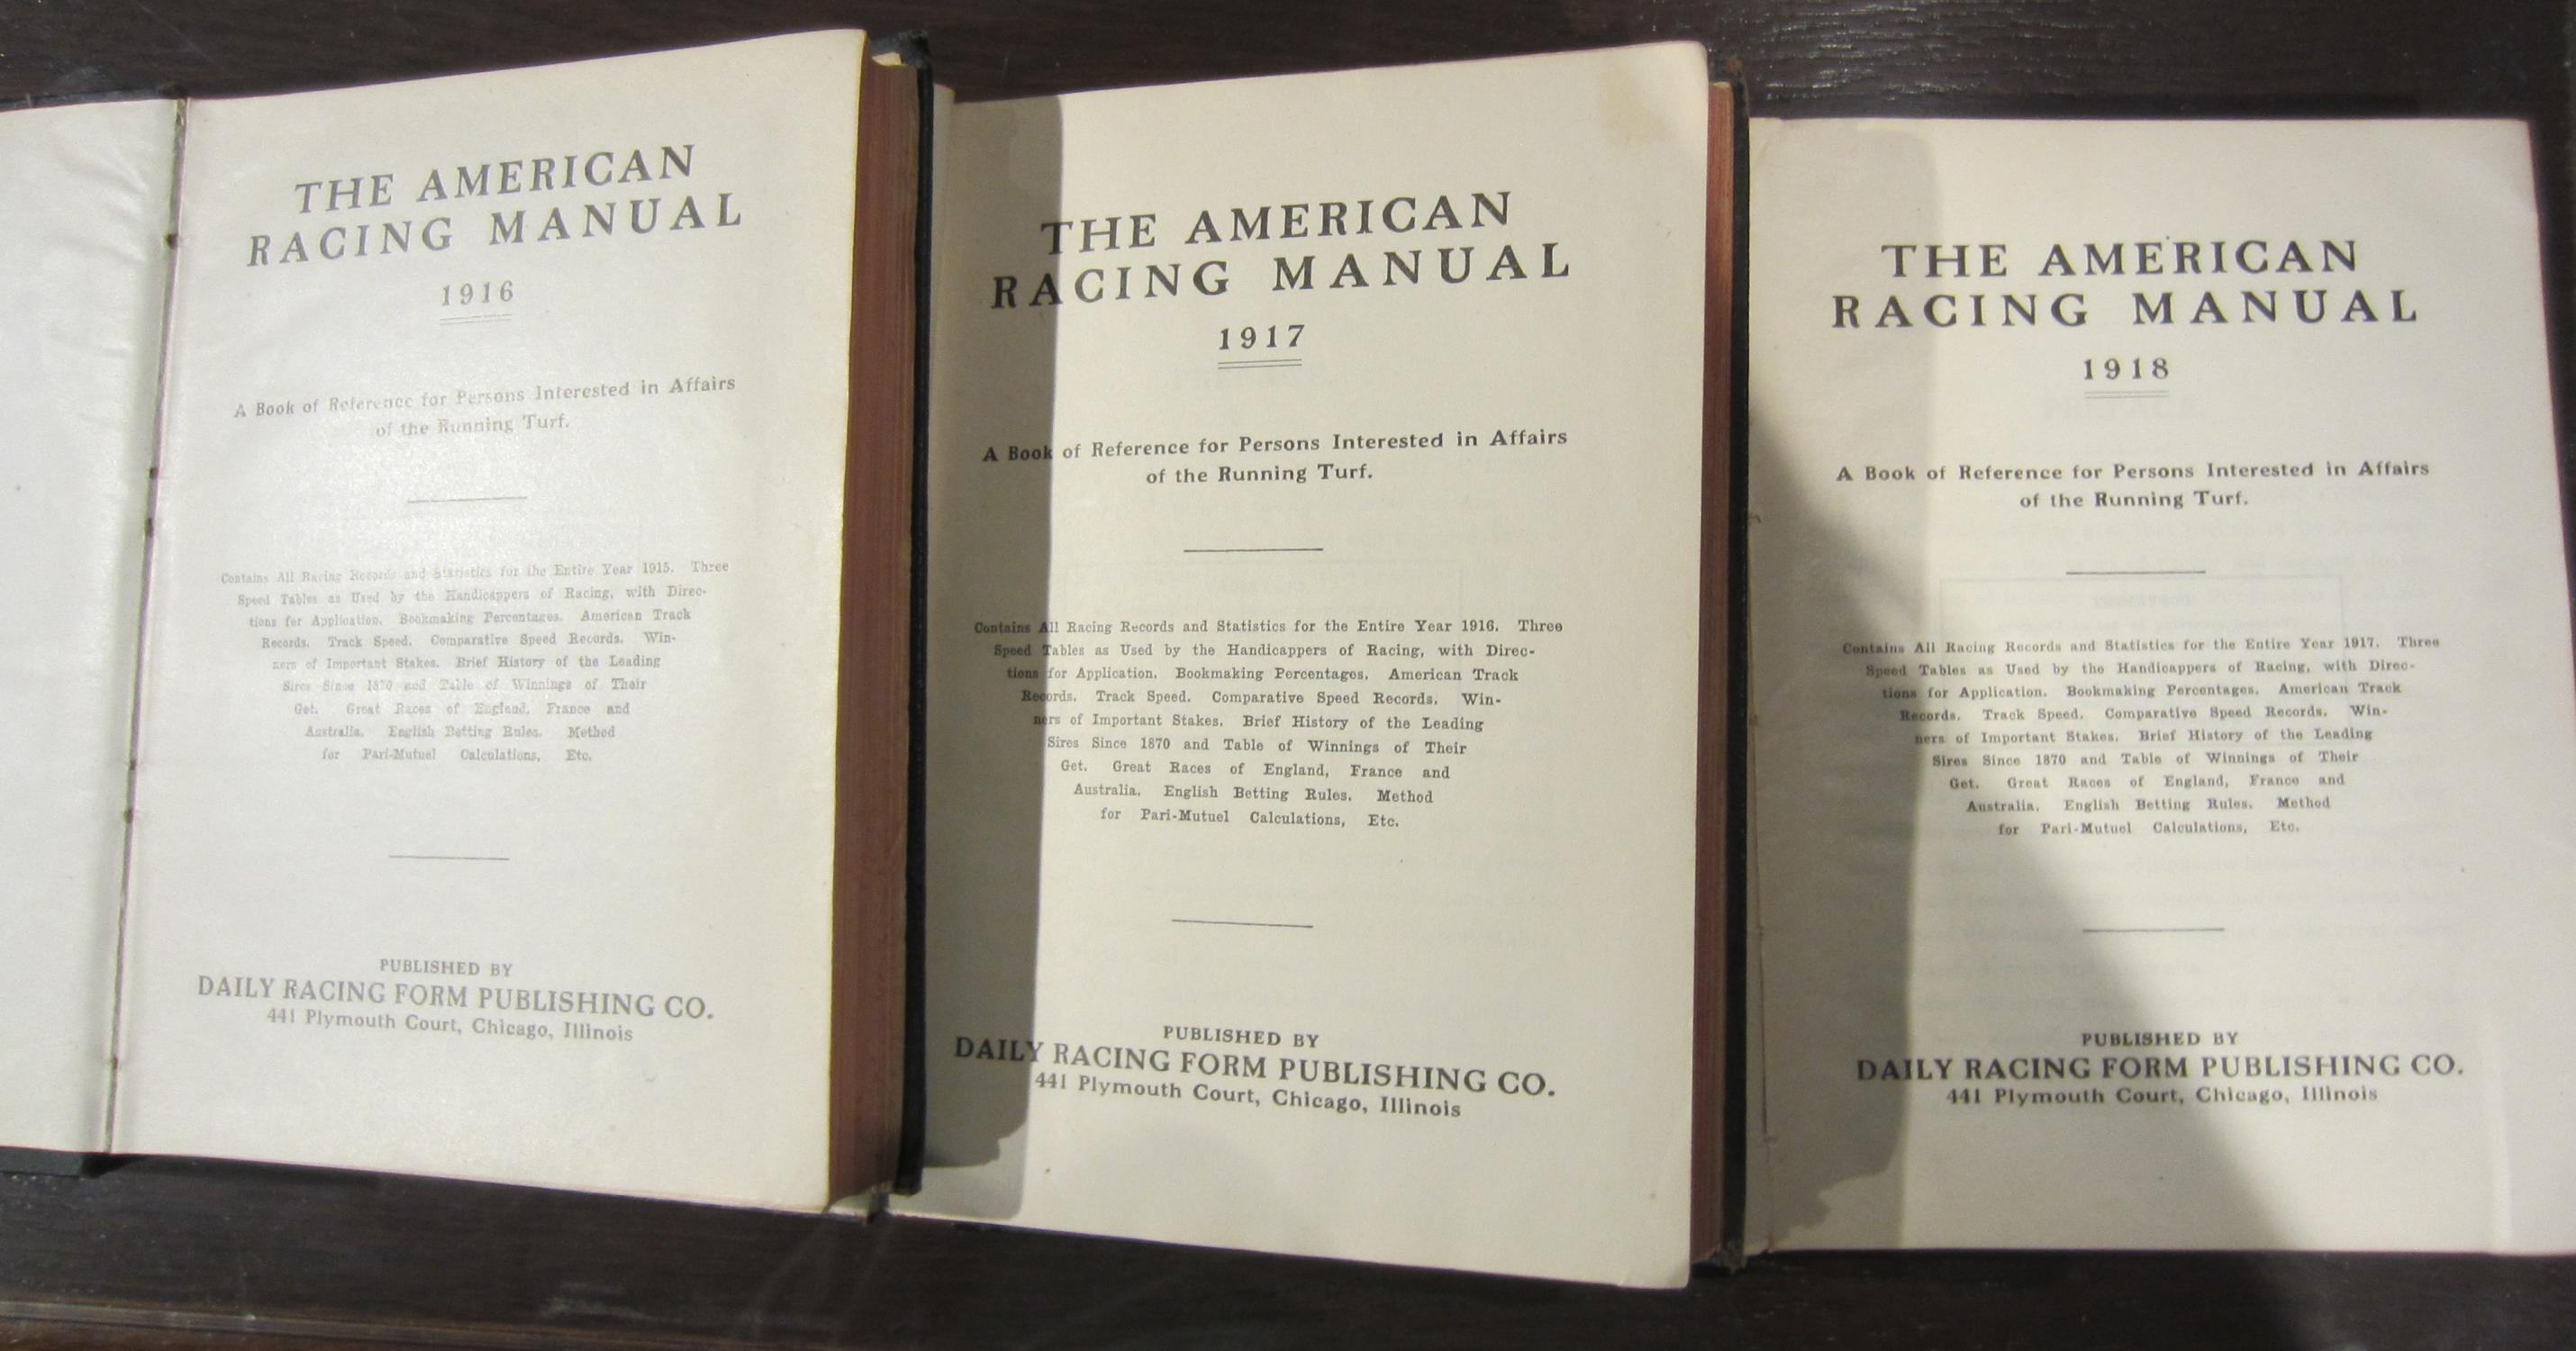 American Racing Manuals, 80 Volumes, Years